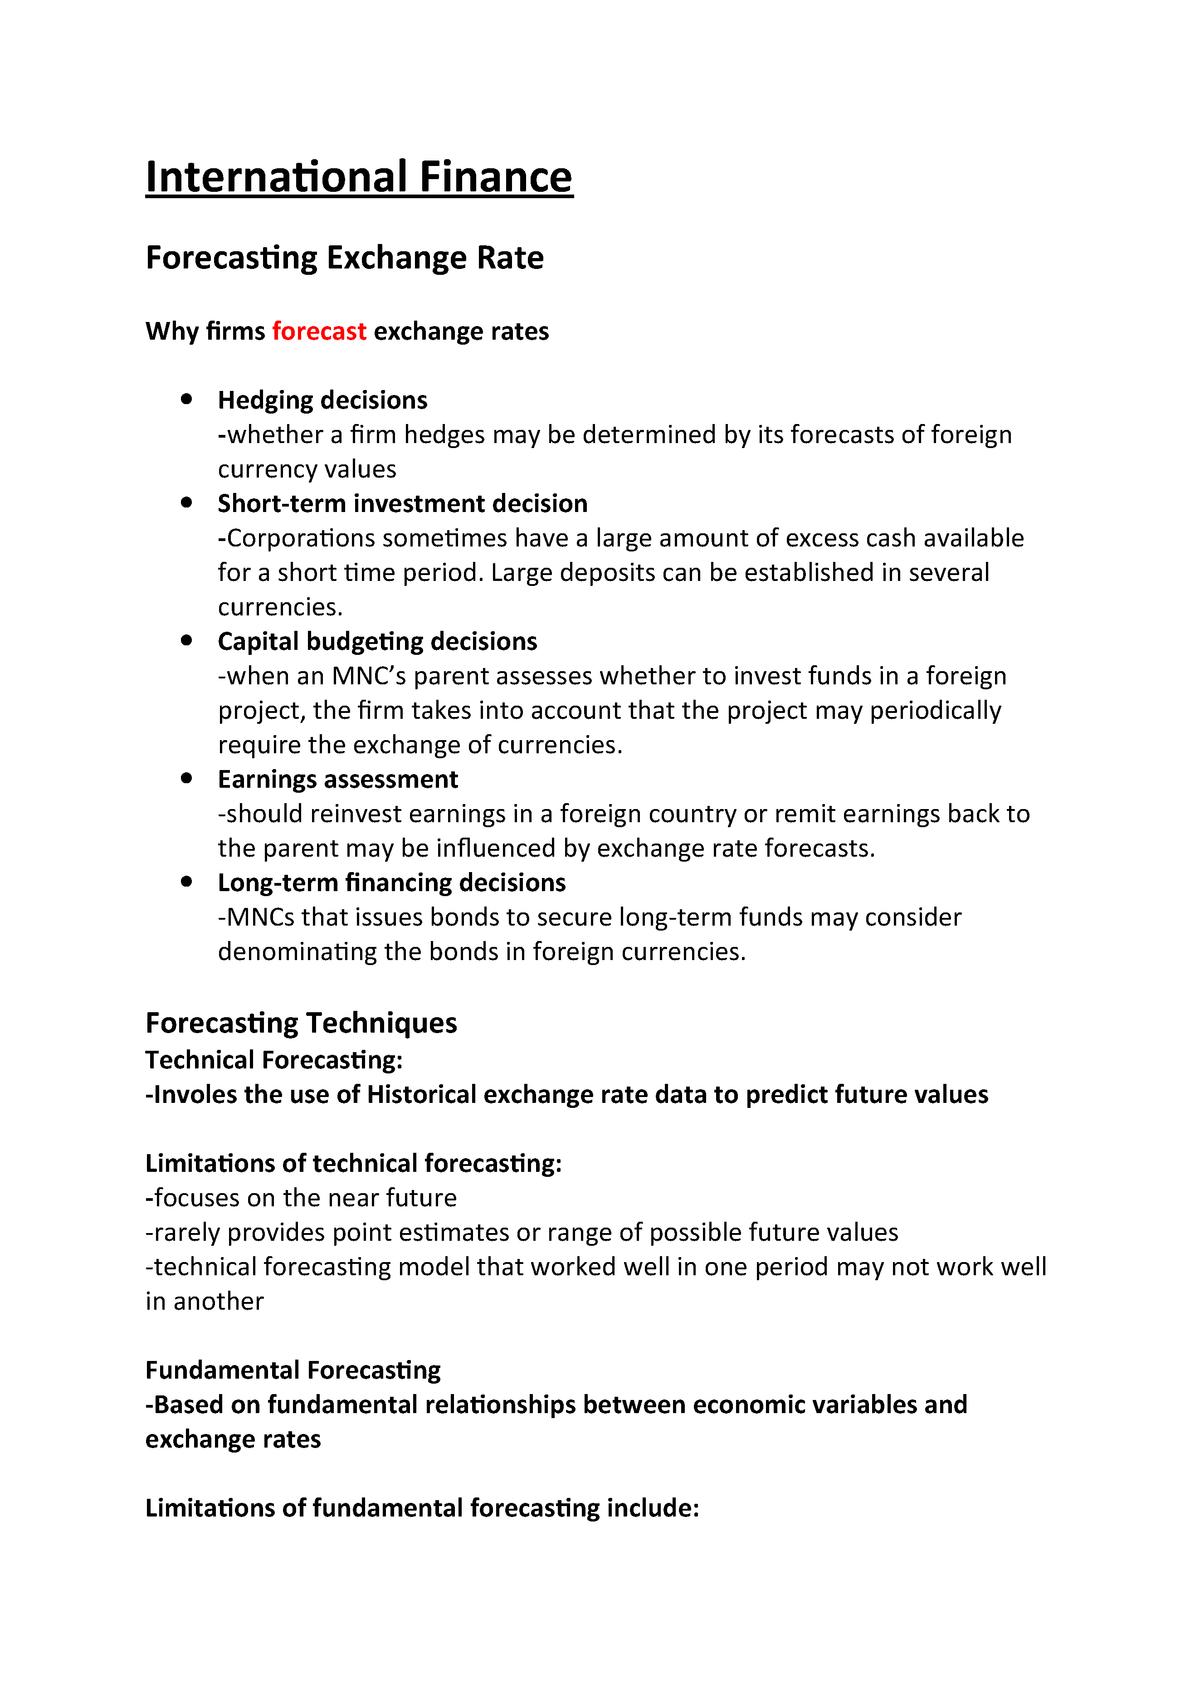 International Finance week 7 notes - BEA309: International